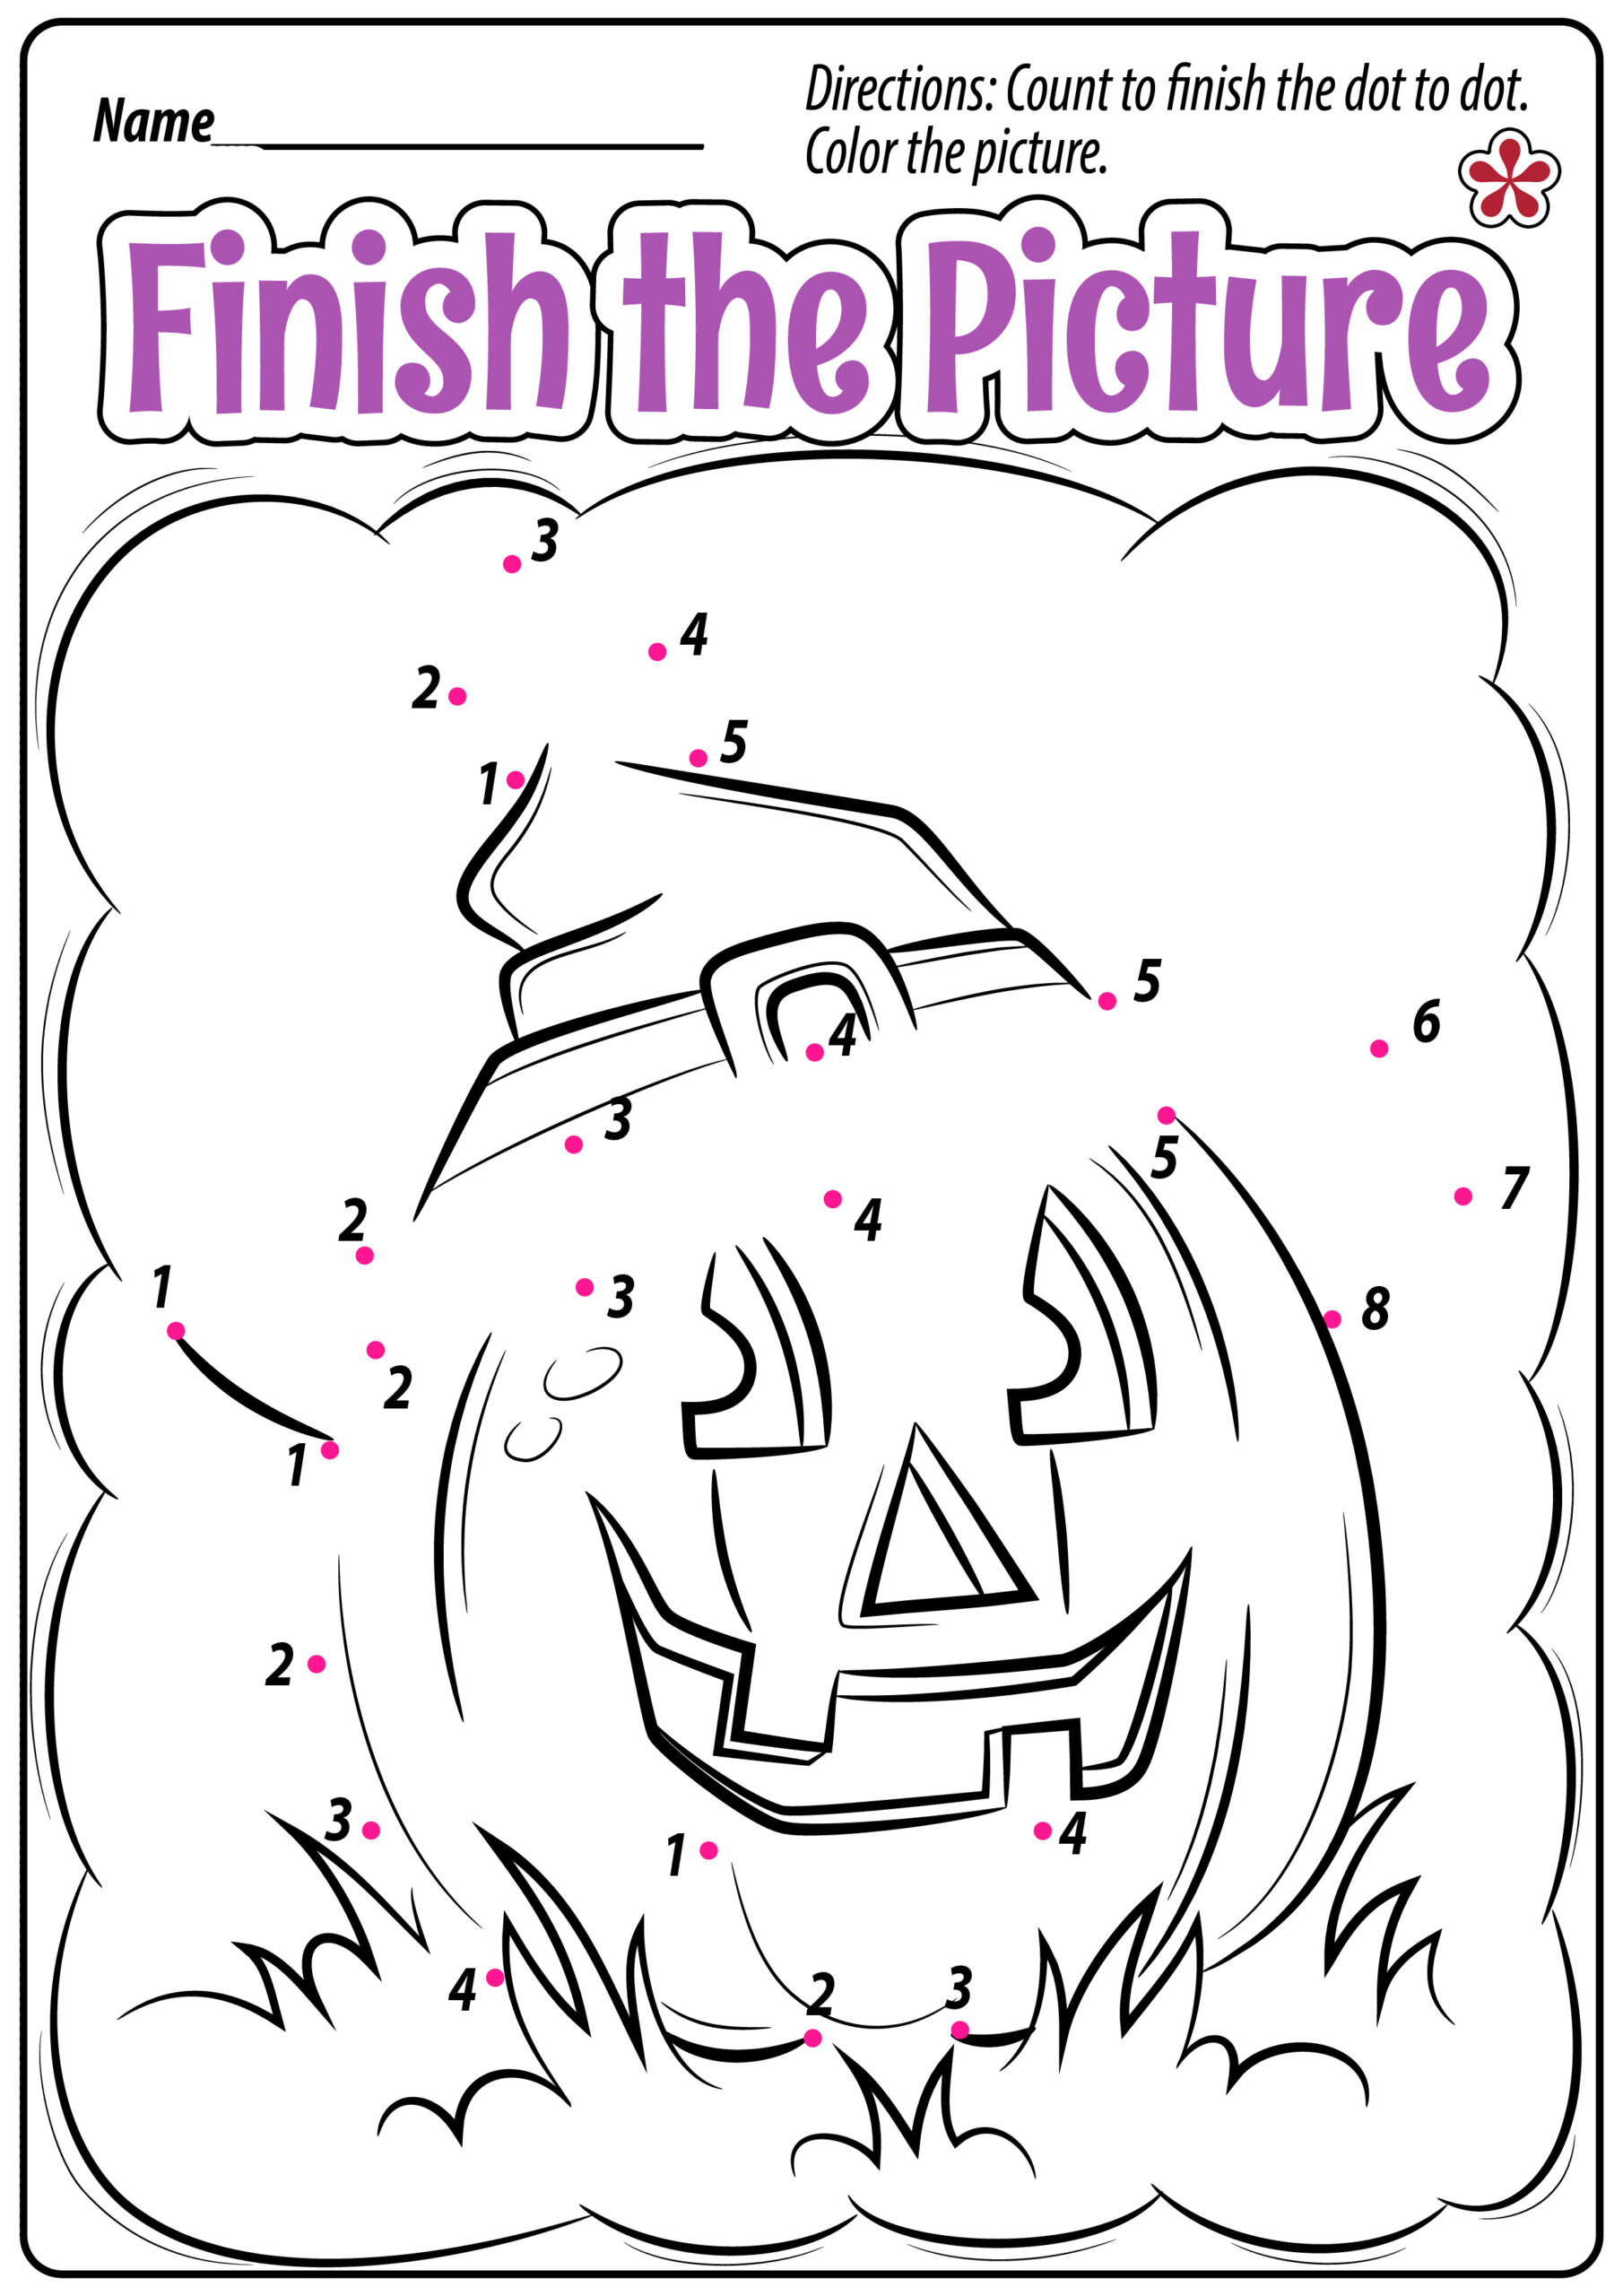 Halloween Dot-To-Dot Worksheets For Preschoolers